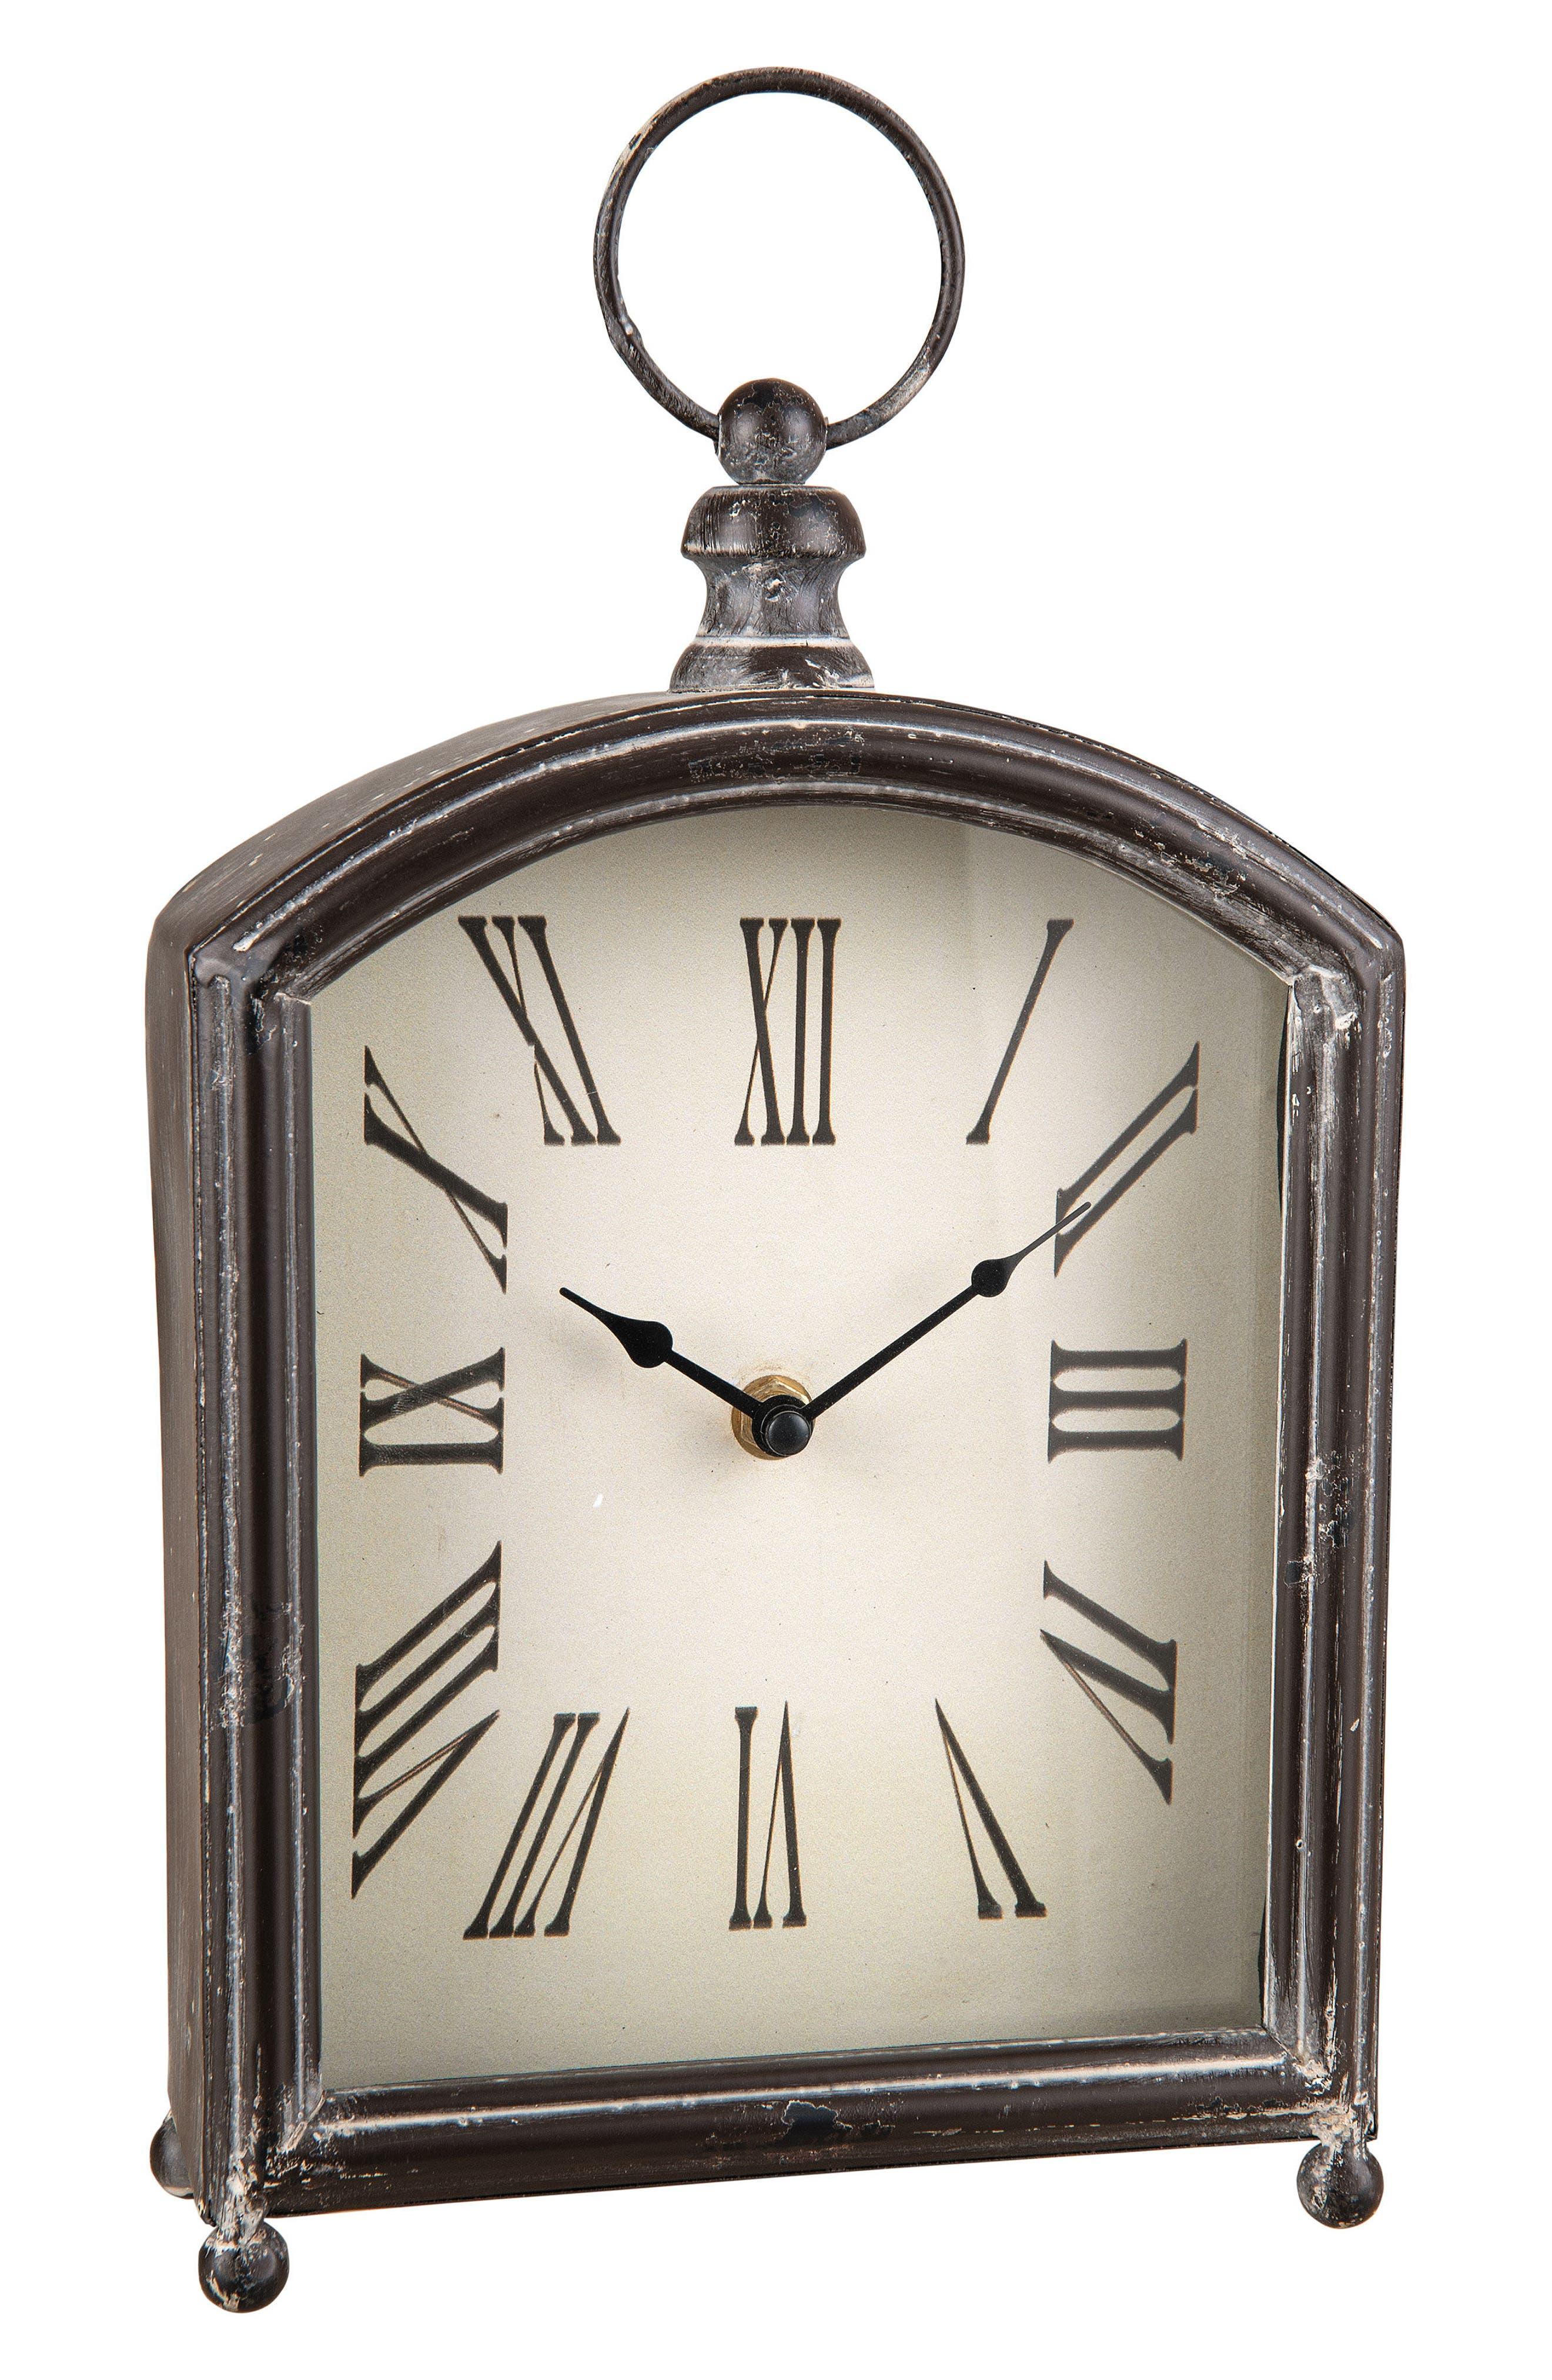 Ranch Table Clock,                             Main thumbnail 1, color,                             Metal/ Glass/ Wood